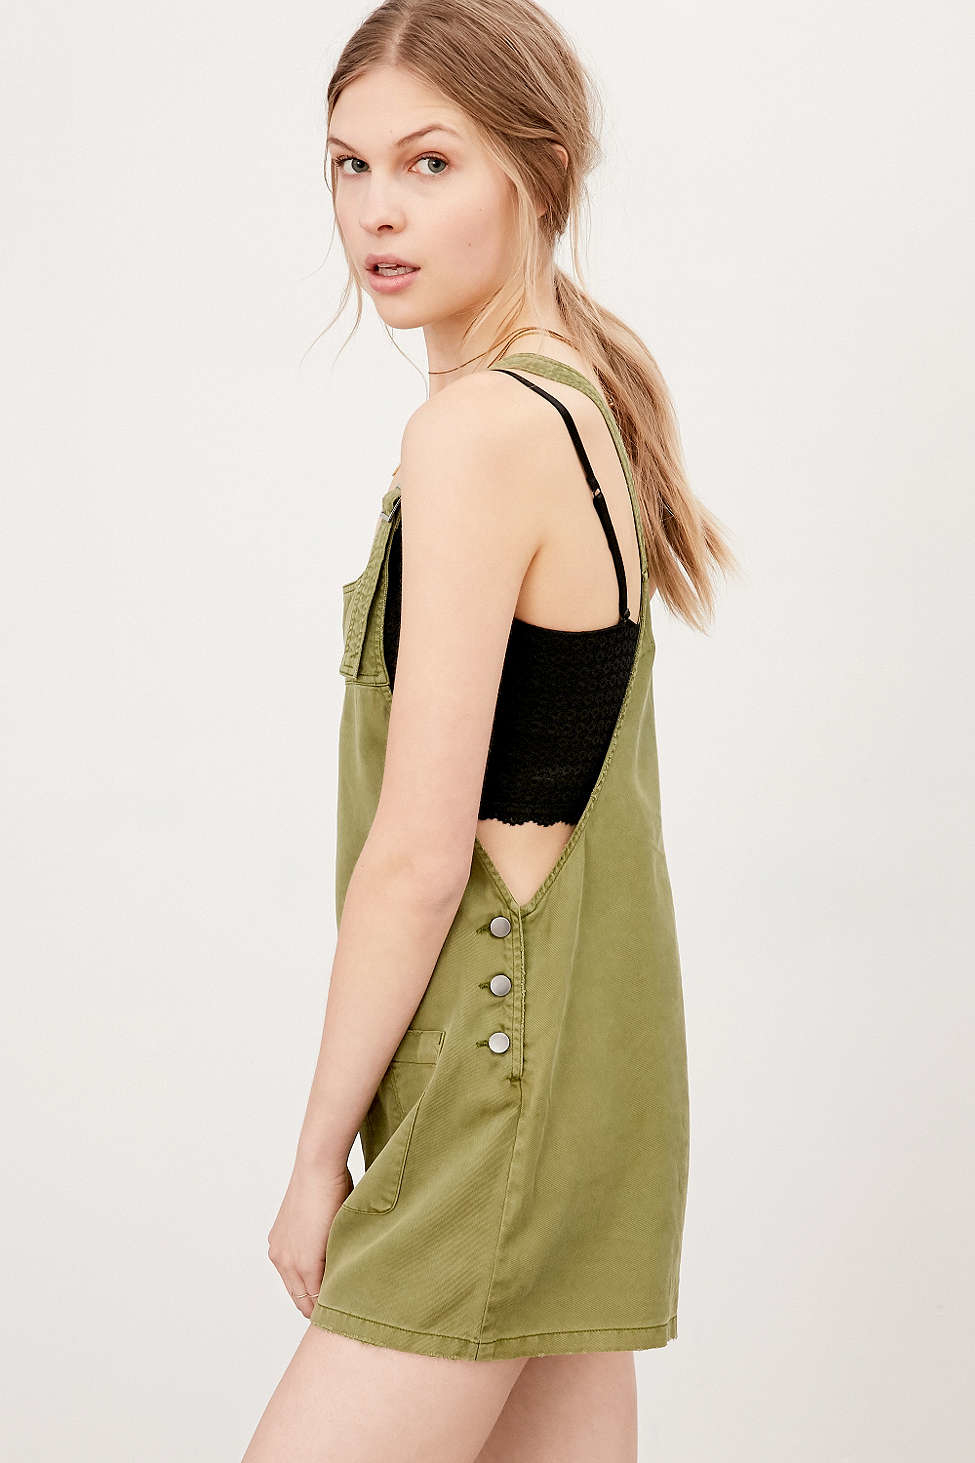 Bdg Nicki Overall Romper In Green Lyst